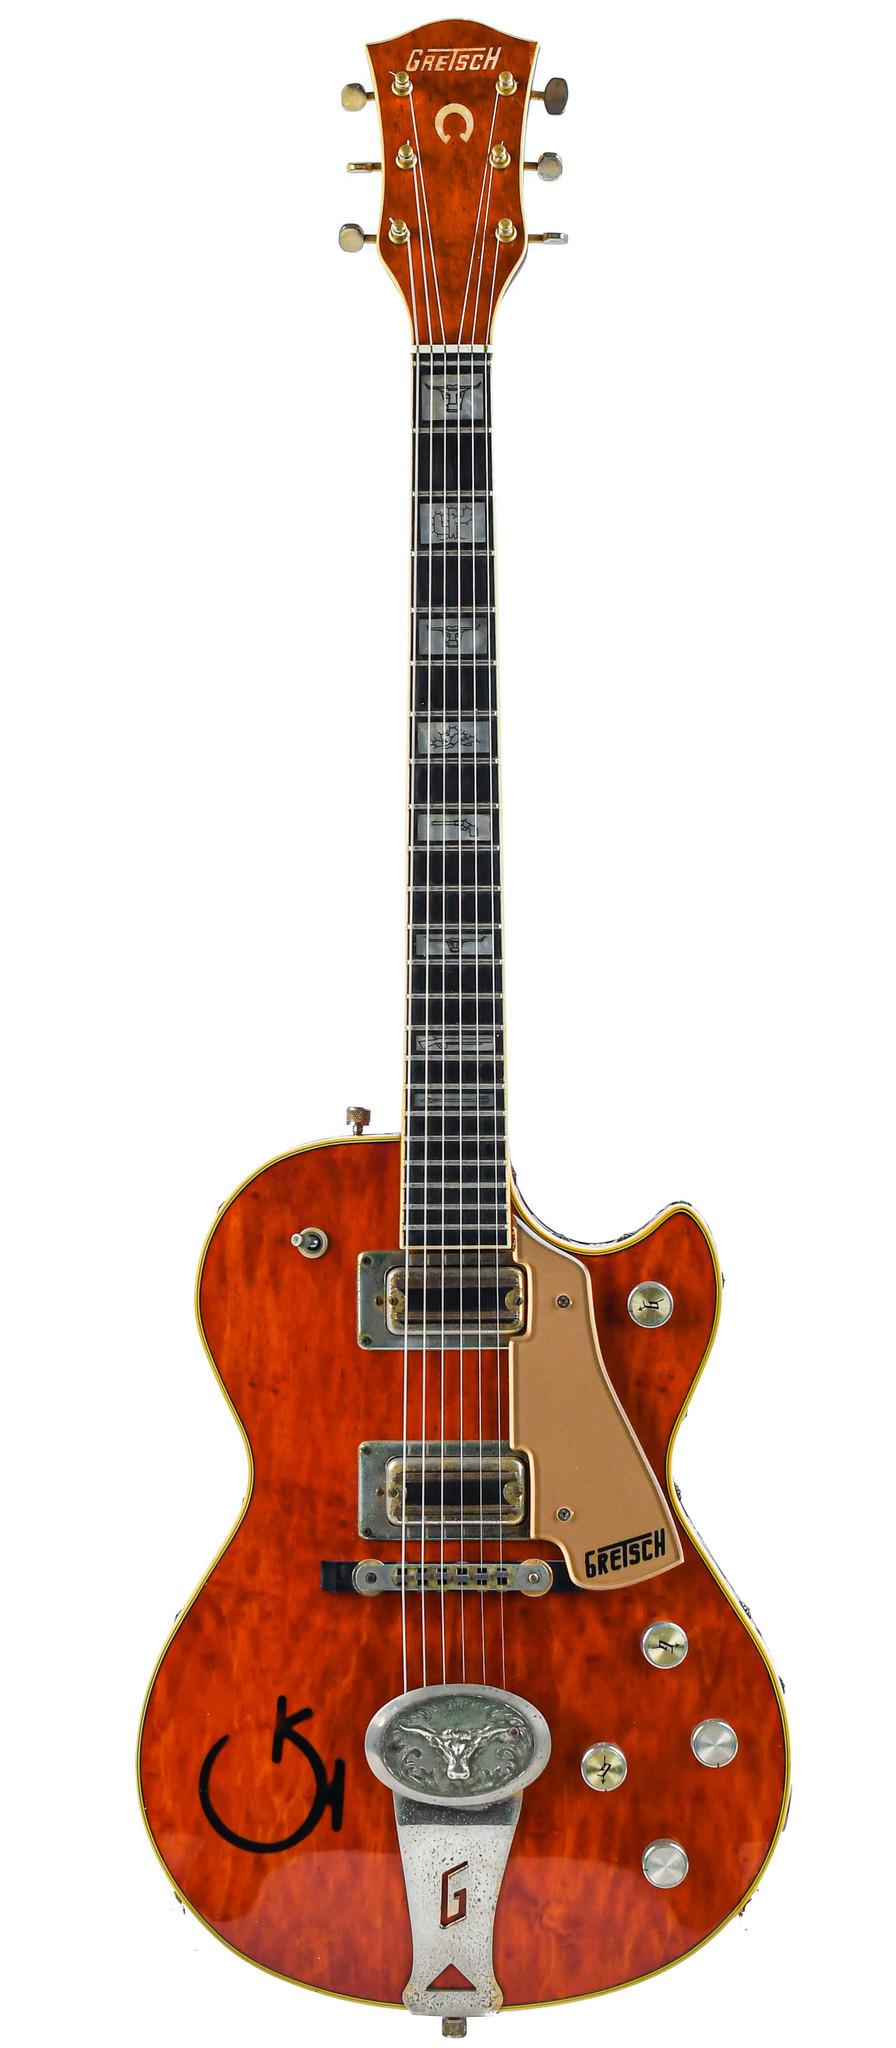 Gretsch Country Roc 7620 1976